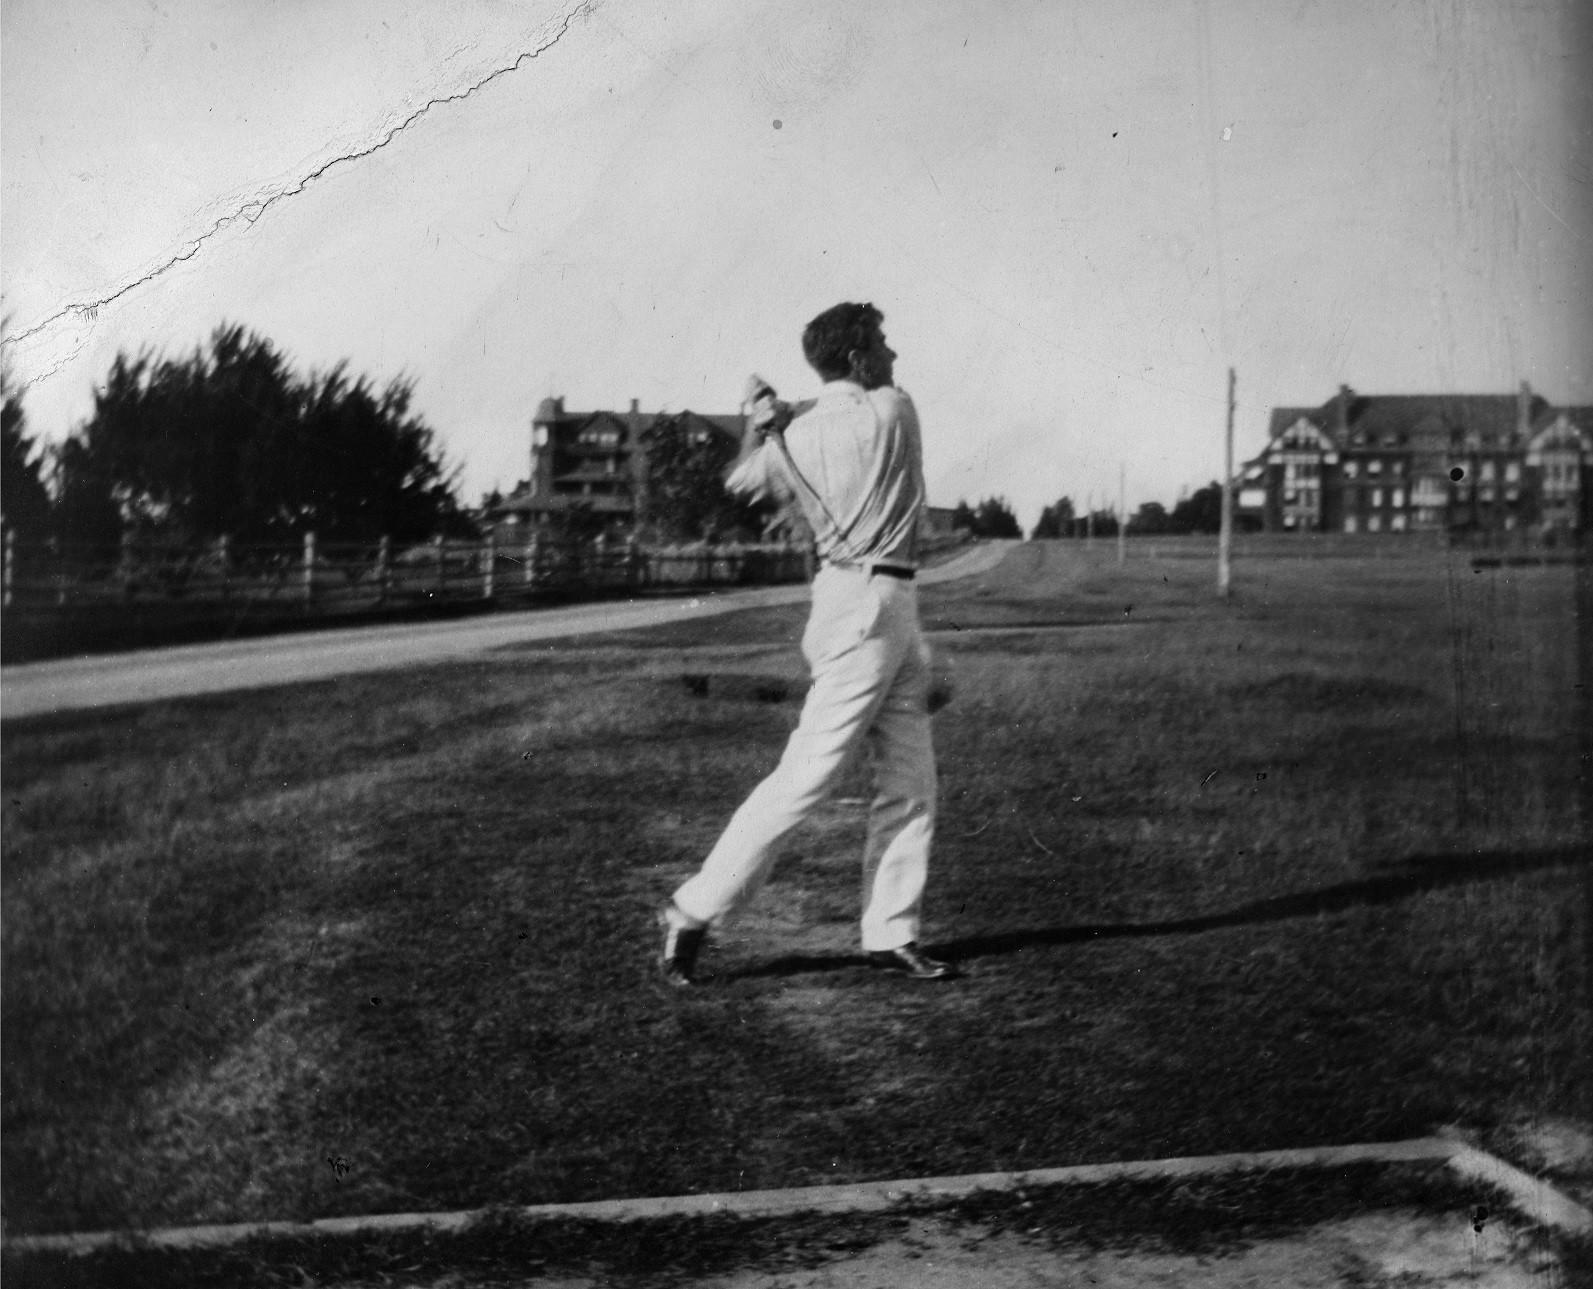 Franklin Delano Roosevelt FDR golfing